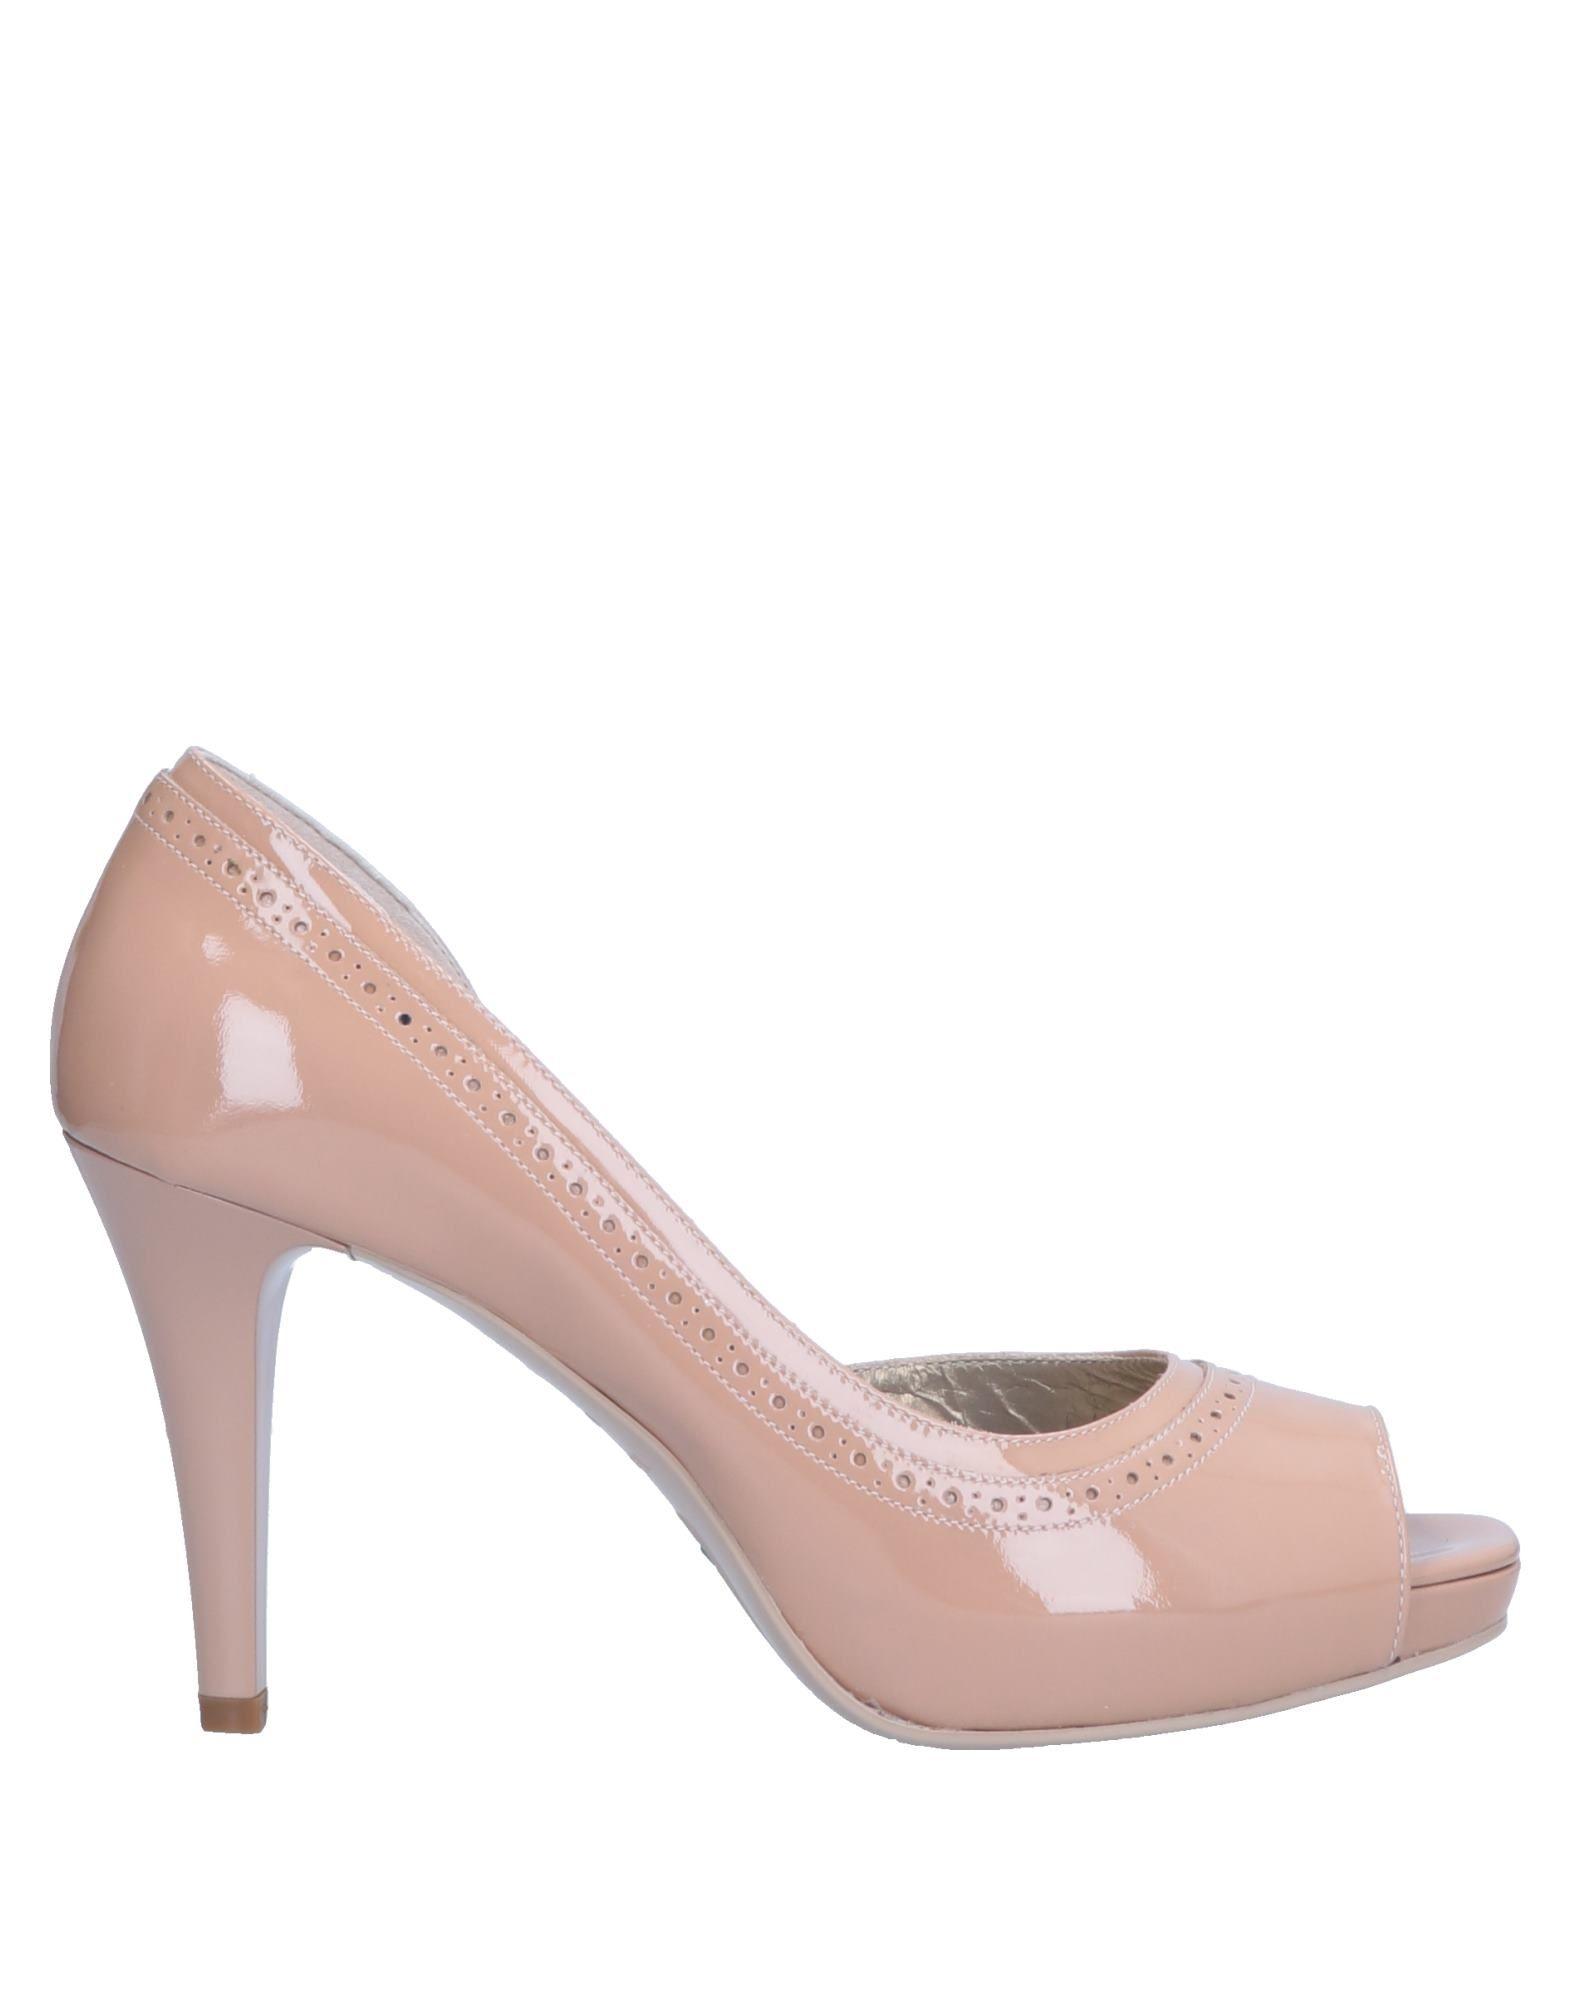 Nero Giardini Gute Pumps Damen  11562304KL Gute Giardini Qualität beliebte Schuhe e45930